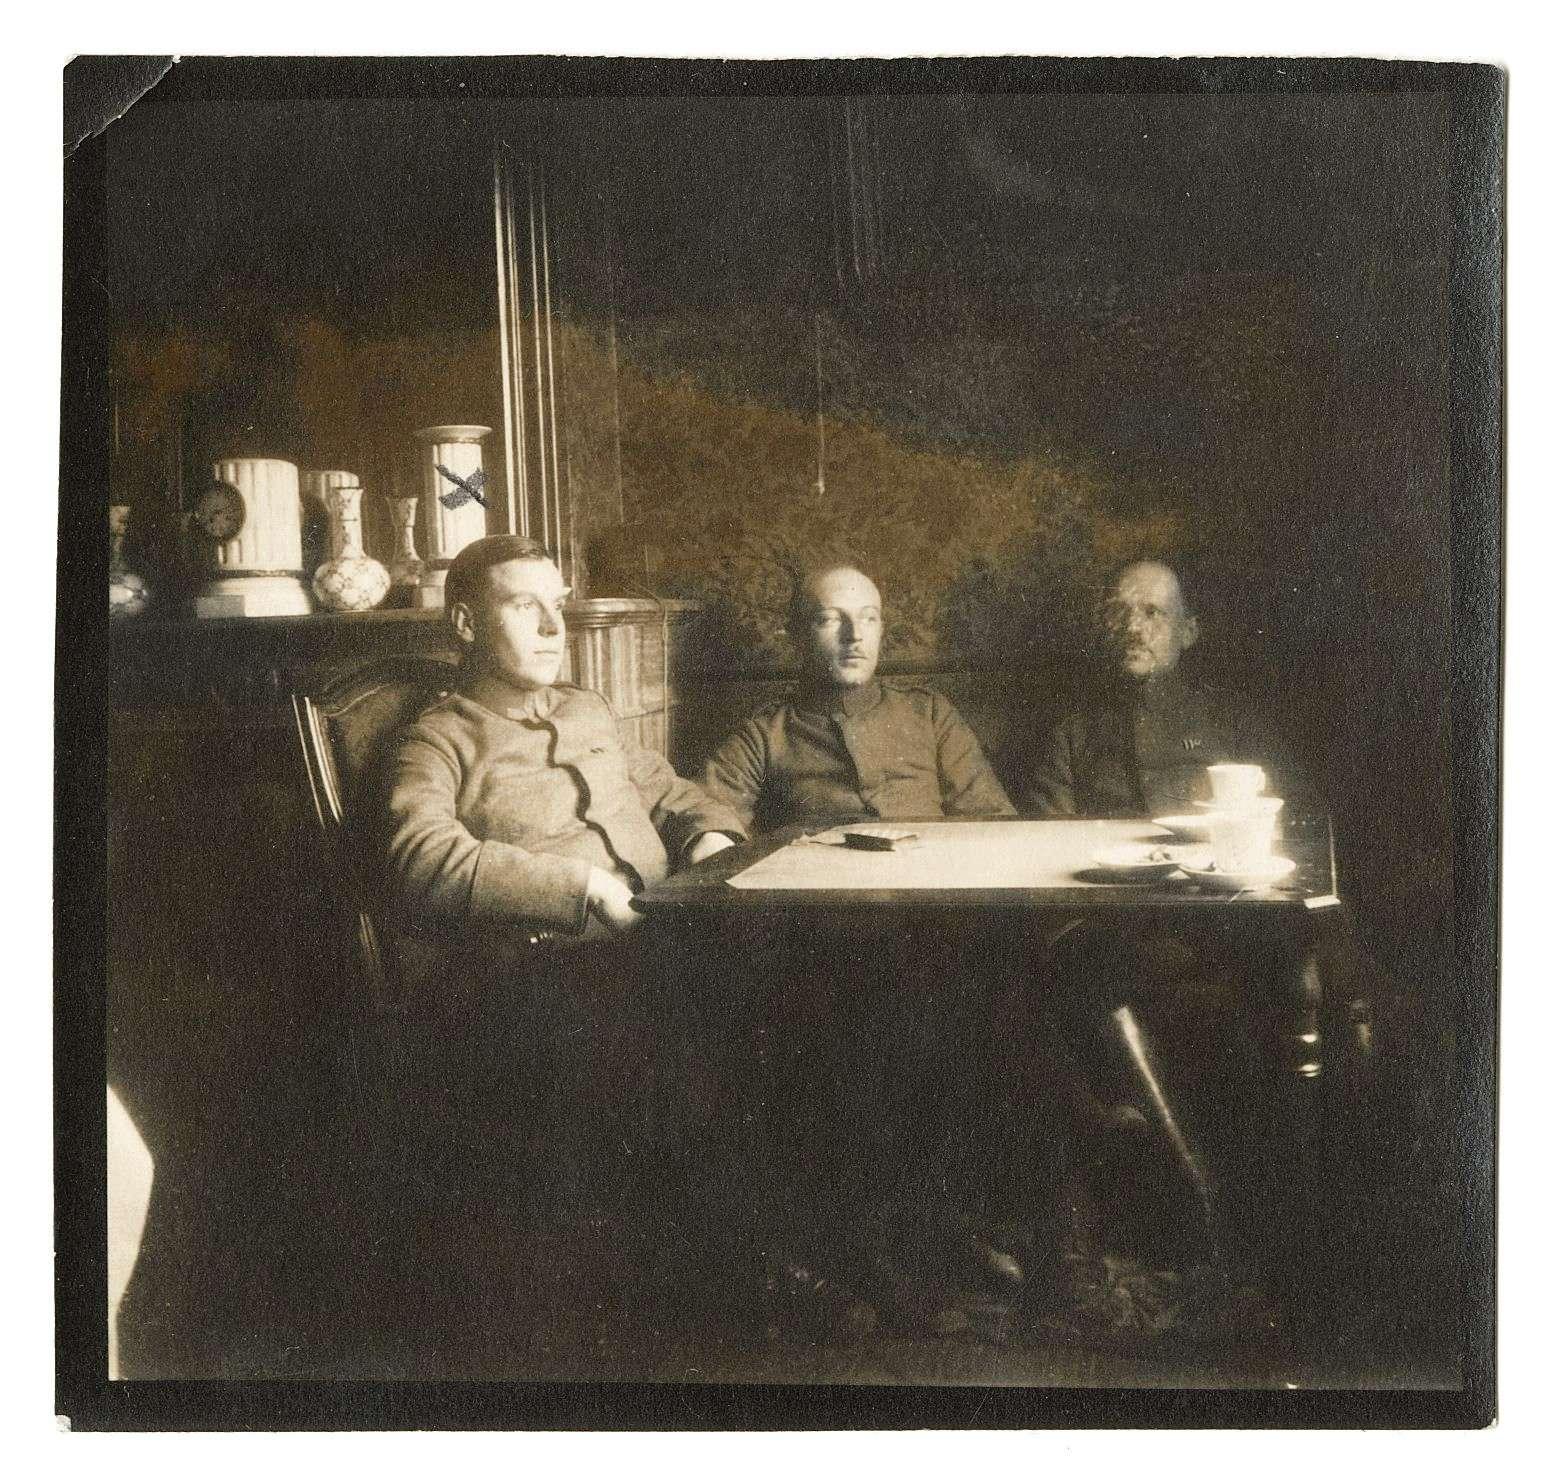 Mahler, Richard, Bild 3